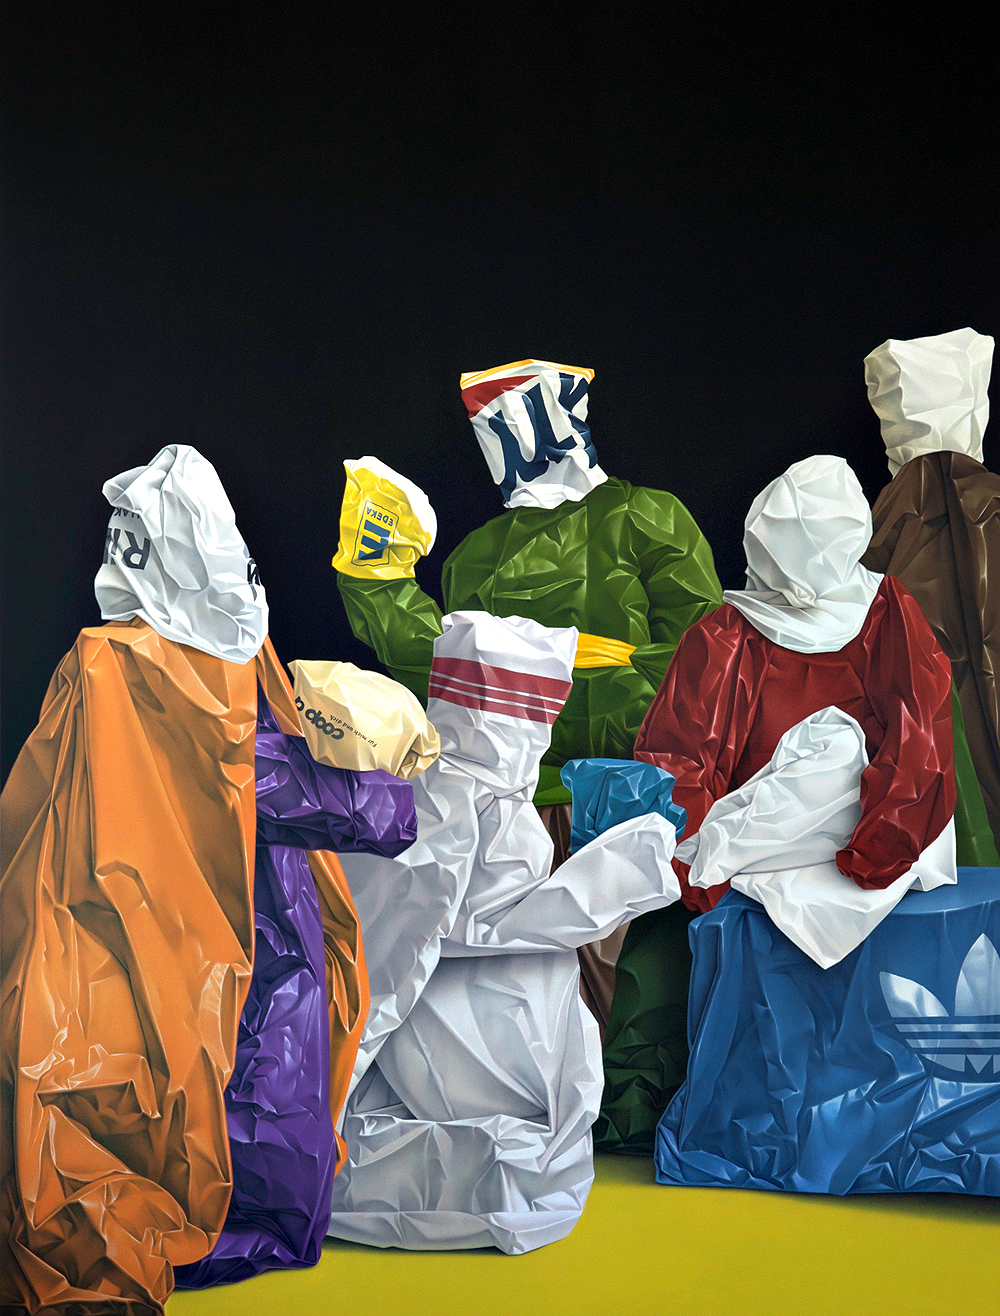 nuncalosabre.Pintura. Painting - ©Eckart Hahn